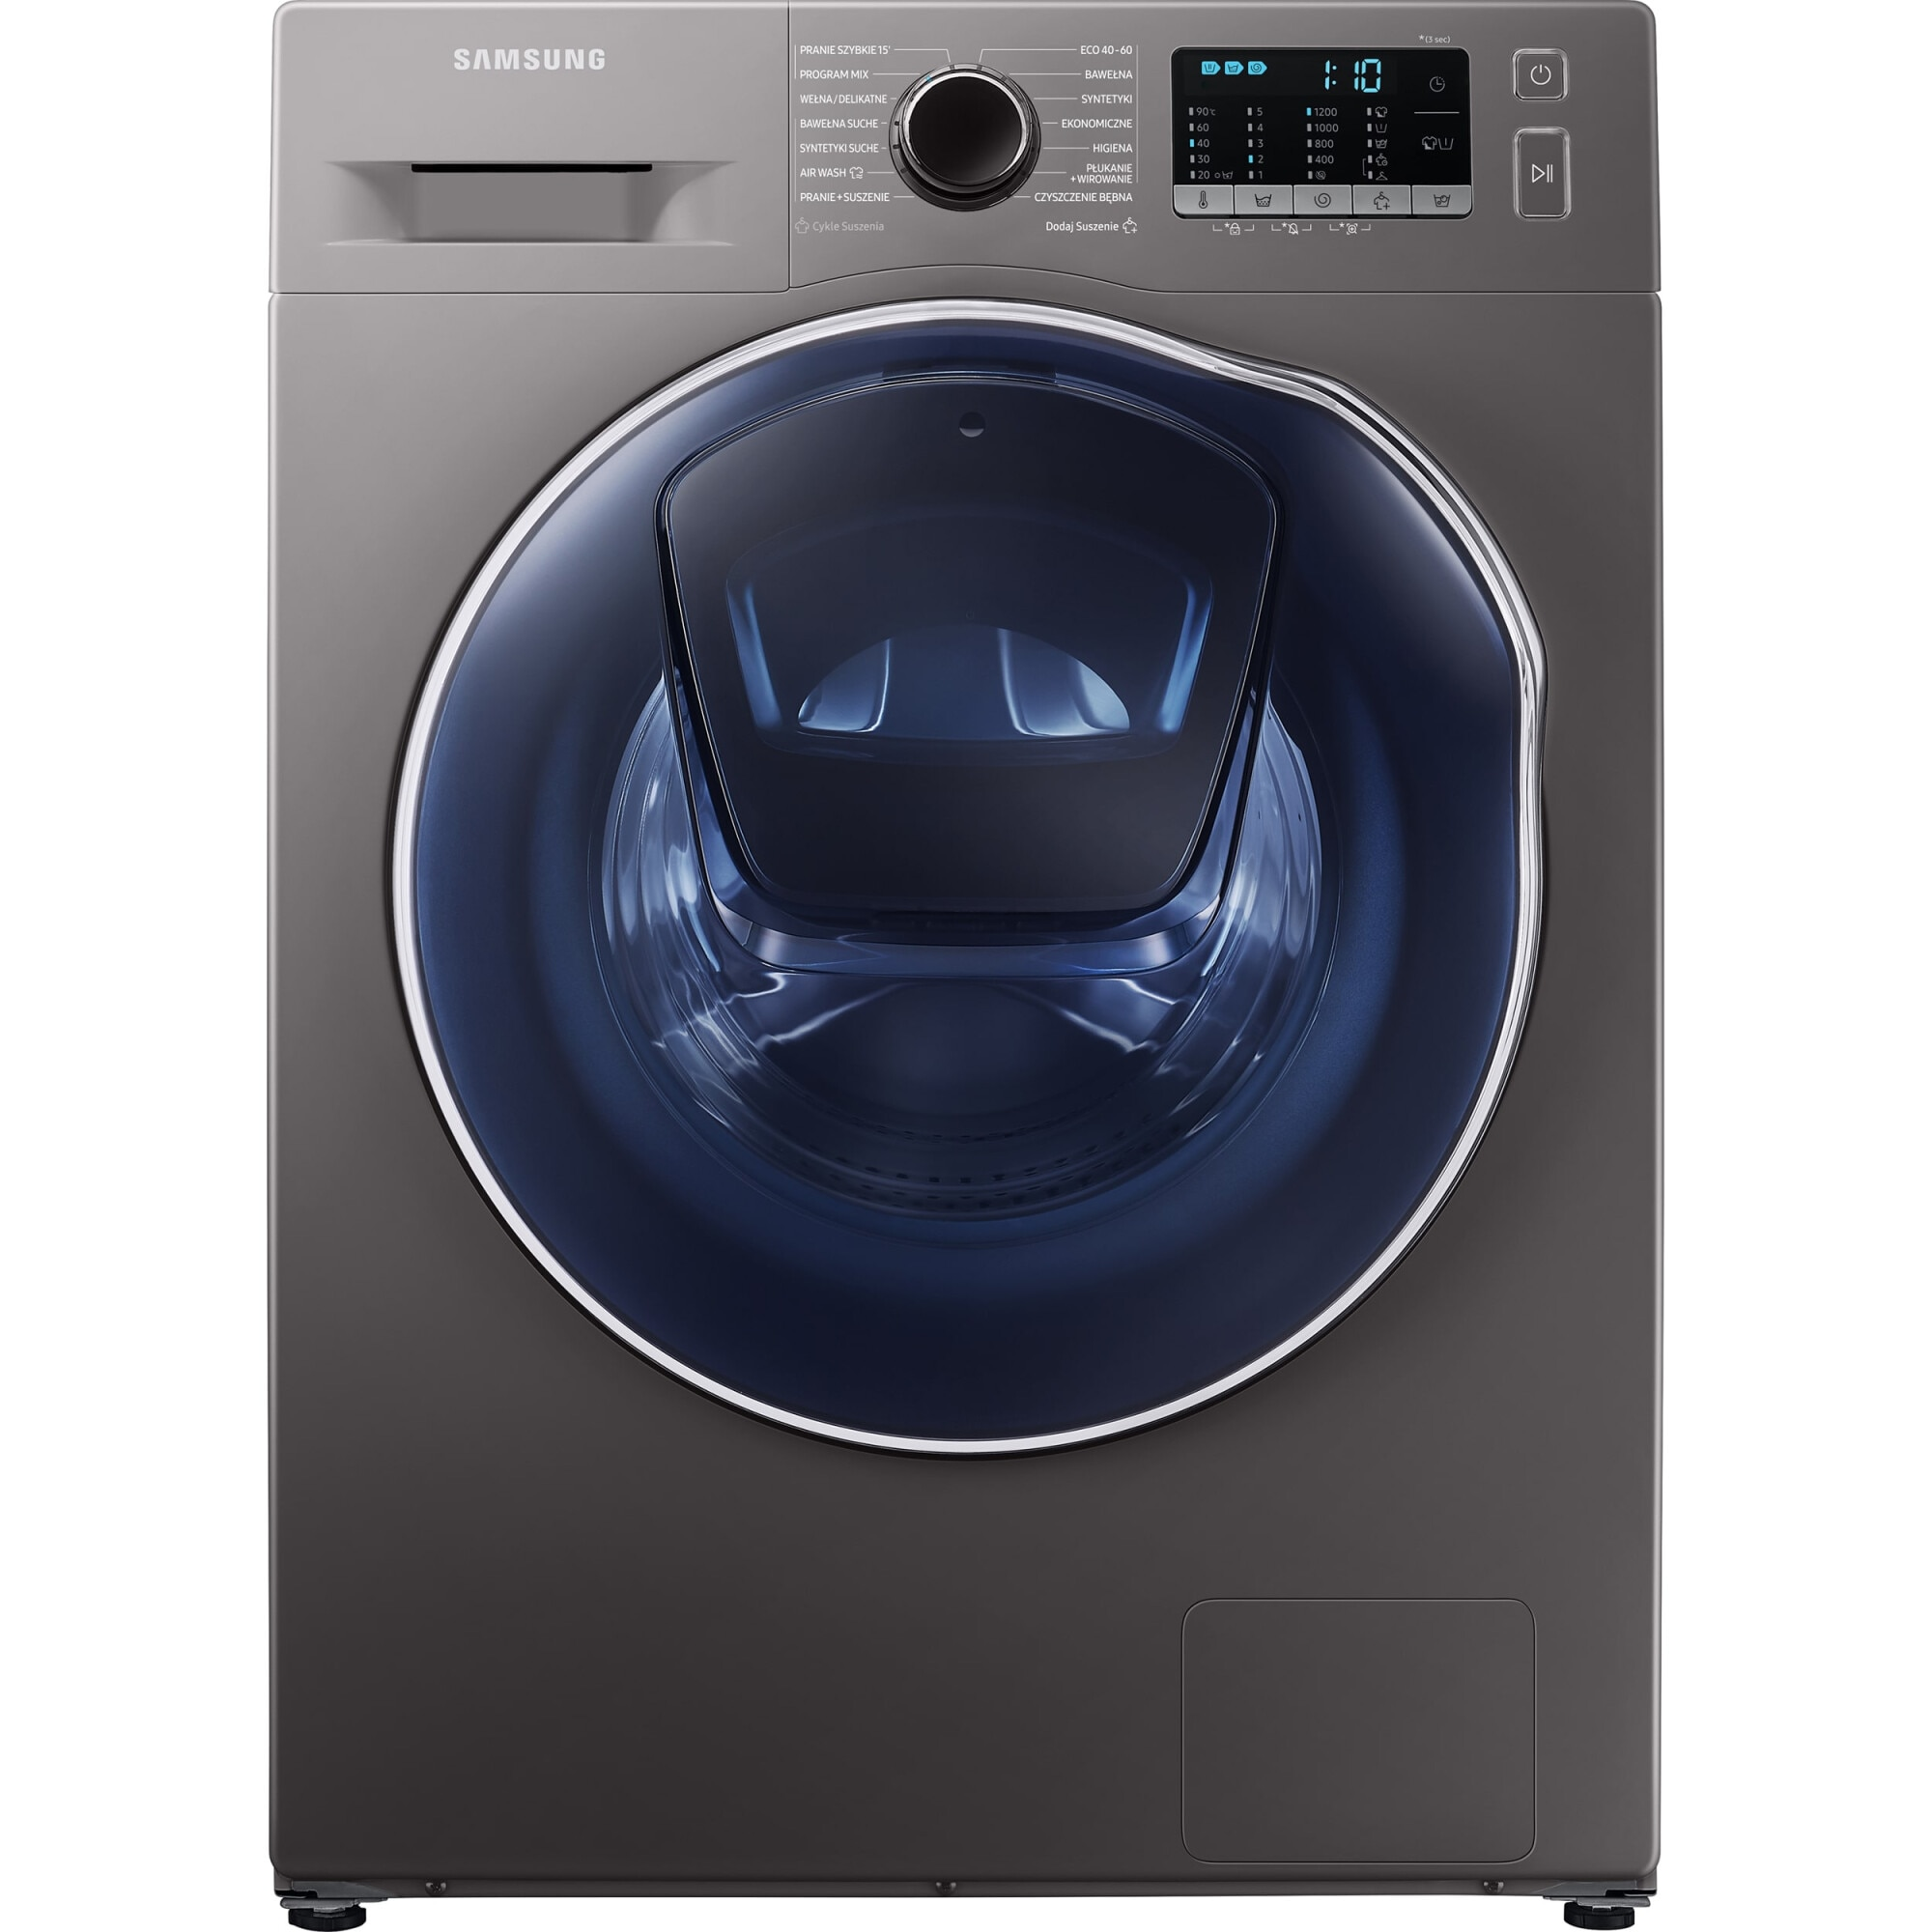 Fotografie Masina de spalat rufe cu uscator Samsung Slim WD8NK52E0ZX/LE, 8 kg spalare, 5 kg uscare, 1200 rpm, Clasa C, Motor Digital Inverter, Eco Bubble, Air Wash, Add Wash, Steam, Inox